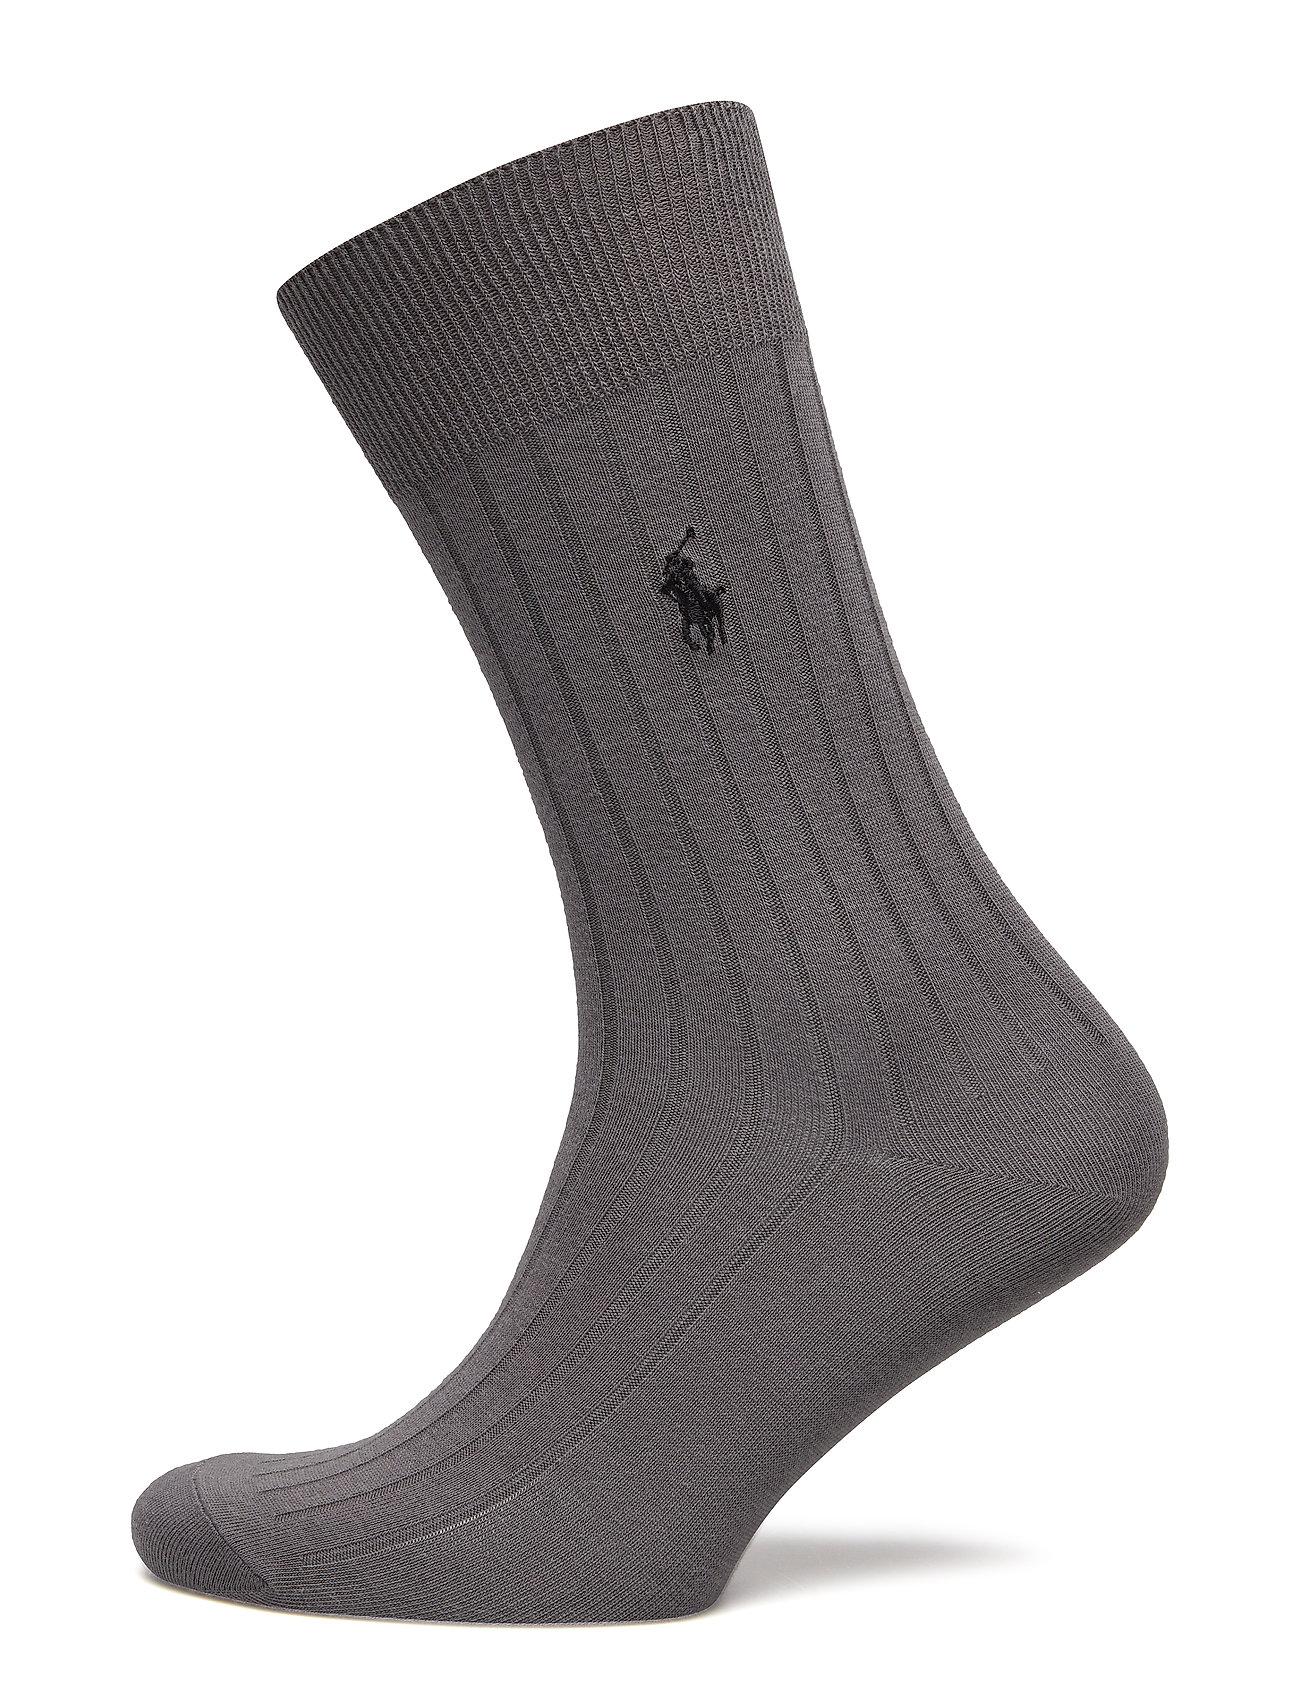 Polo Ralph Lauren Egyptian Cotton Trouser Socks - CHARCOAL HEATHER